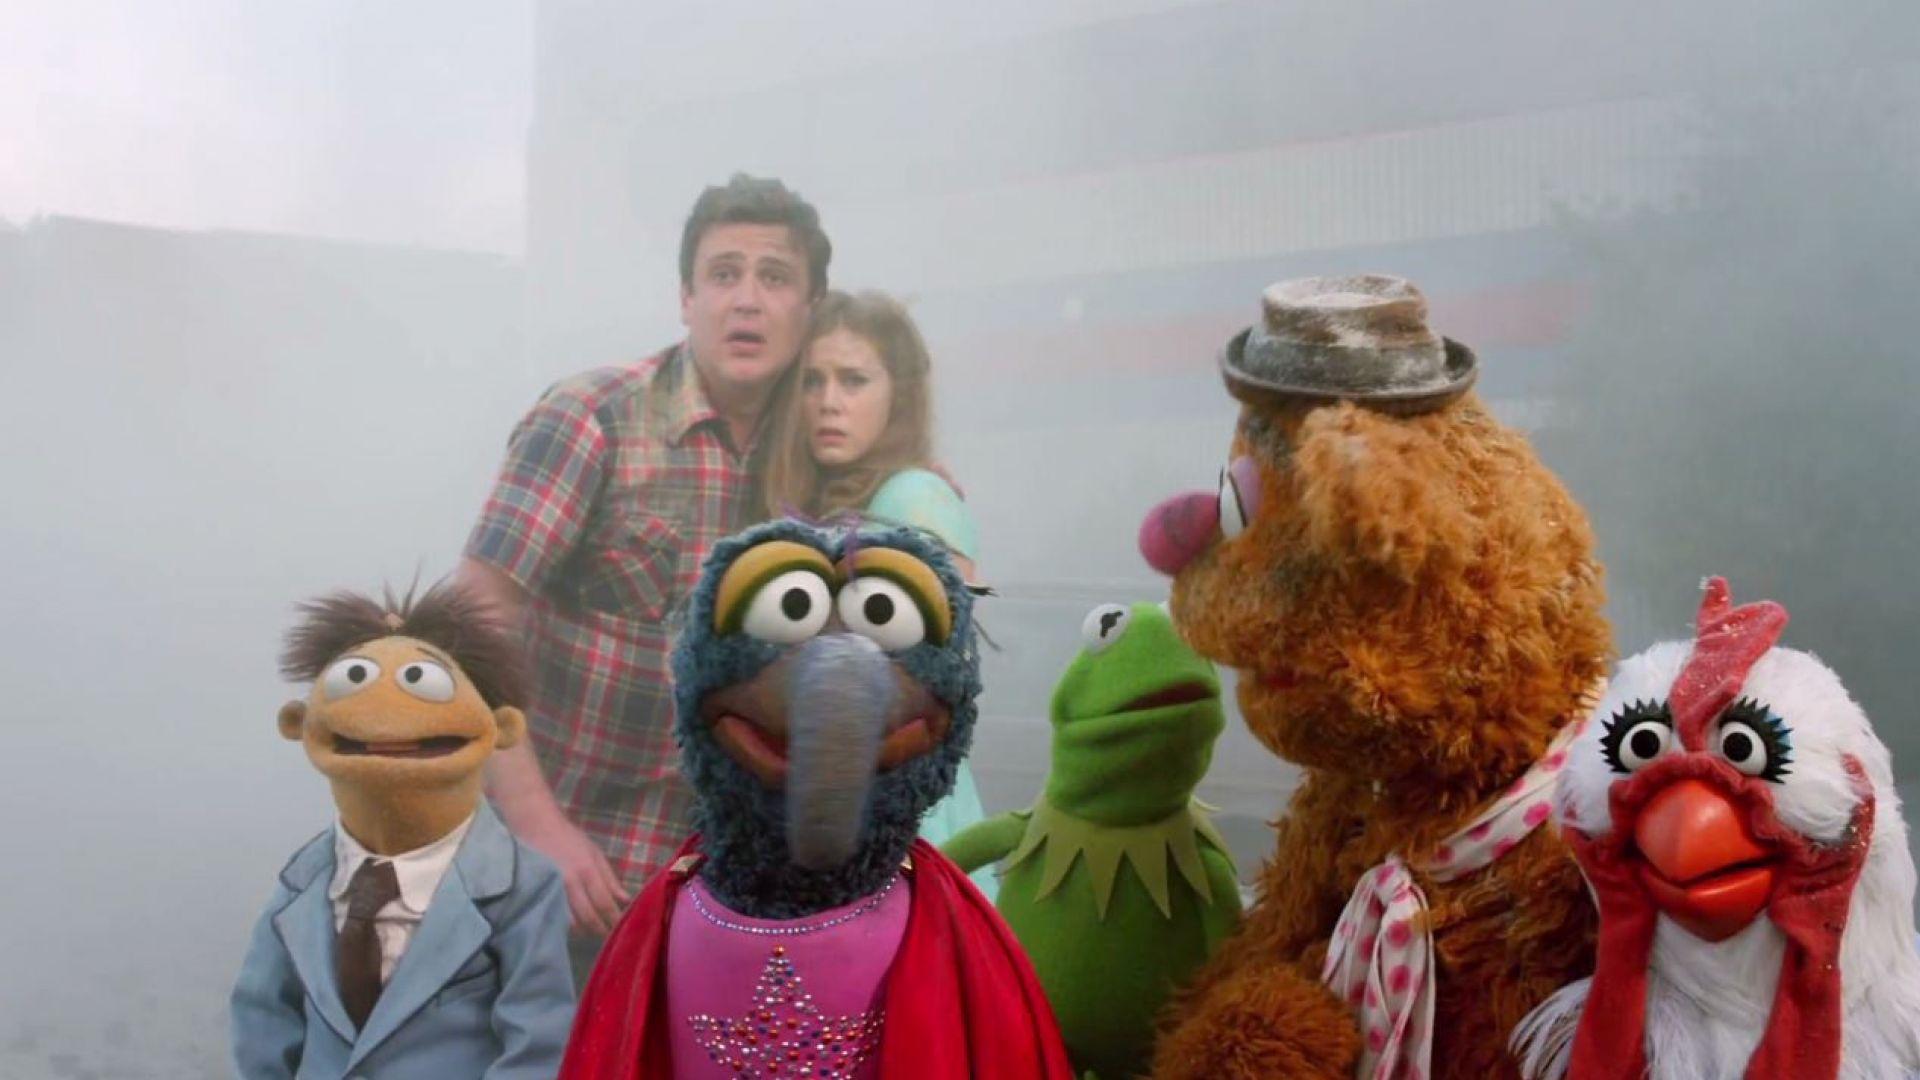 Kermit stars in the 2011 Muppets movie